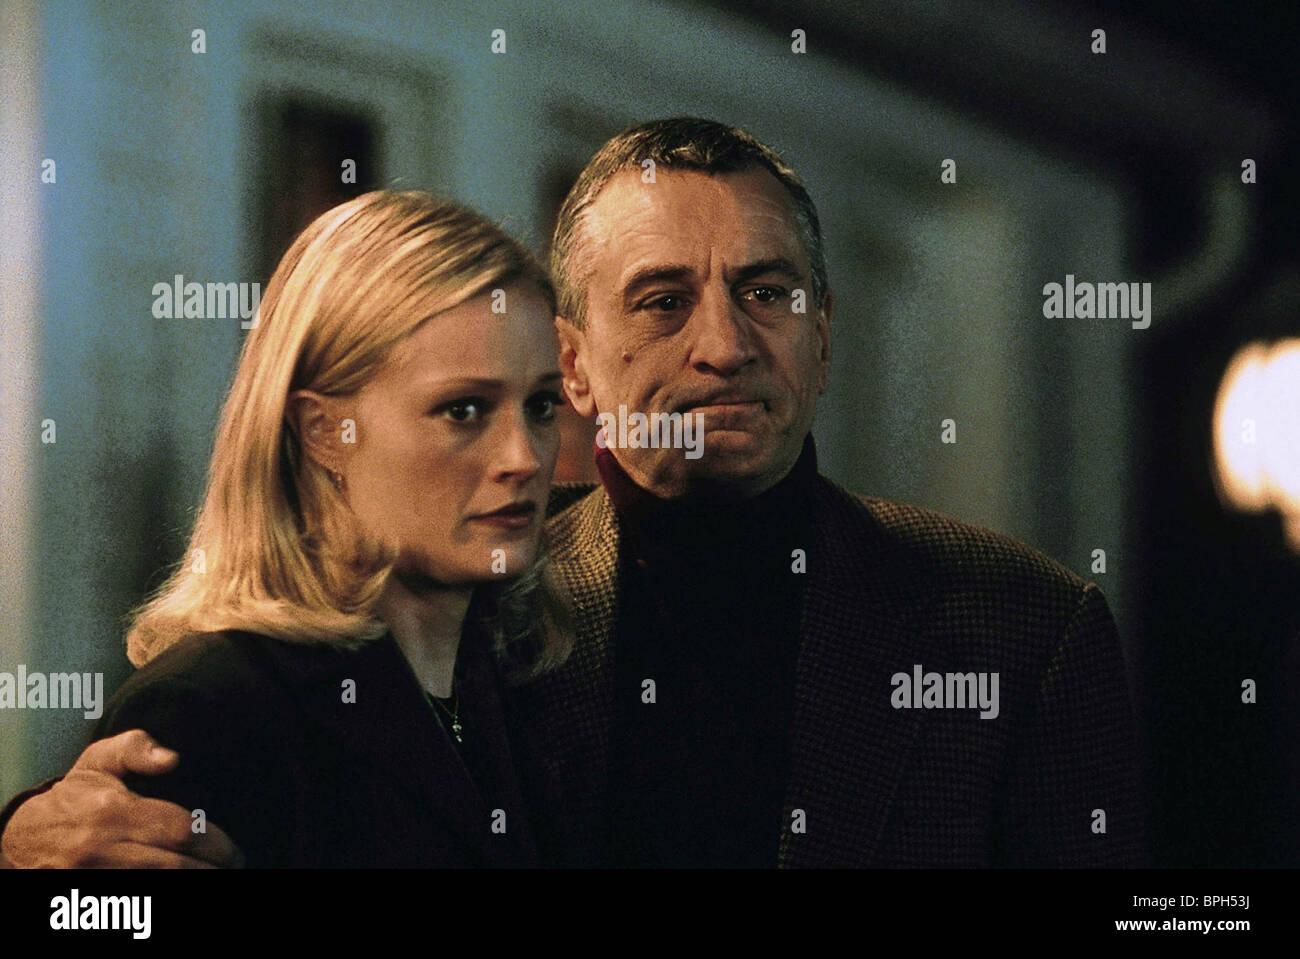 TERI POLO & ROBERT DE NIRO MEET THE PARENTS (2000) - Stock Image